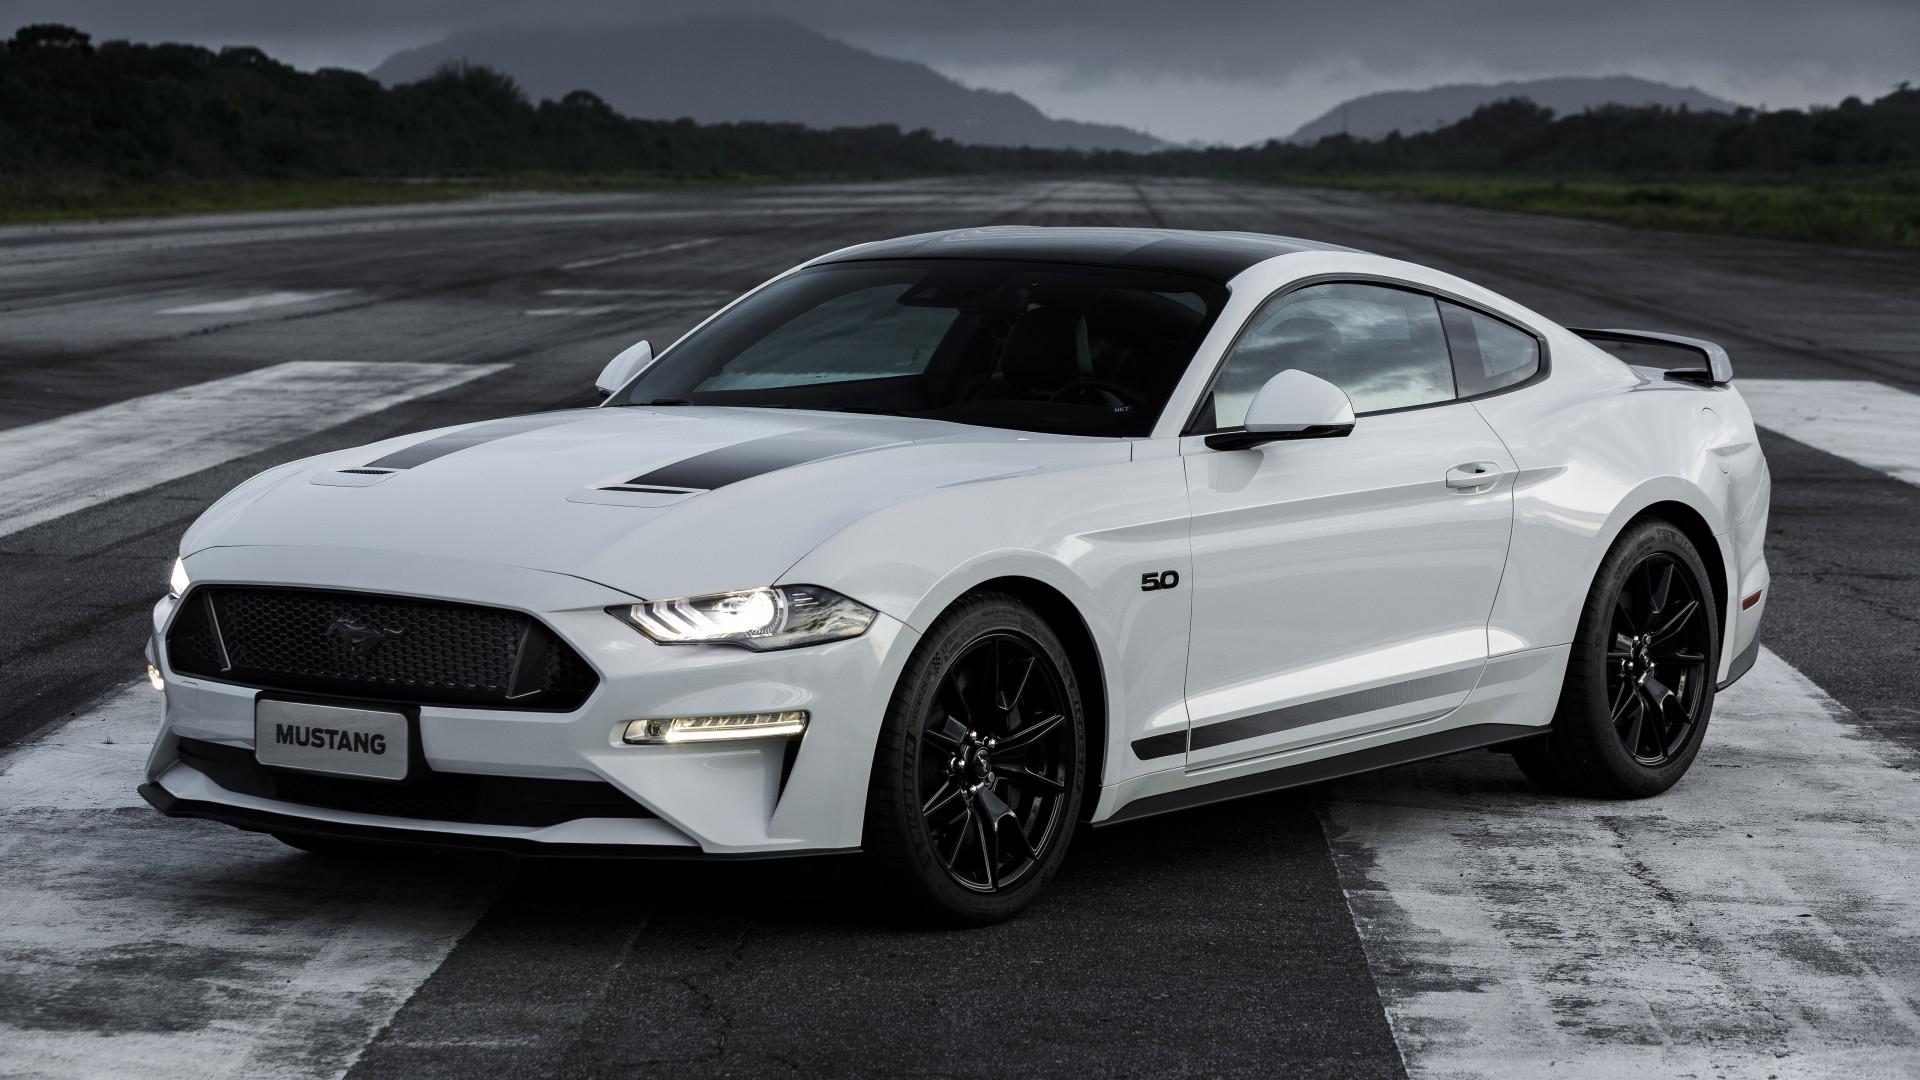 Ford Mustang GT Black Shadow 2019 4K 5K Wallpaper   HD Car ...